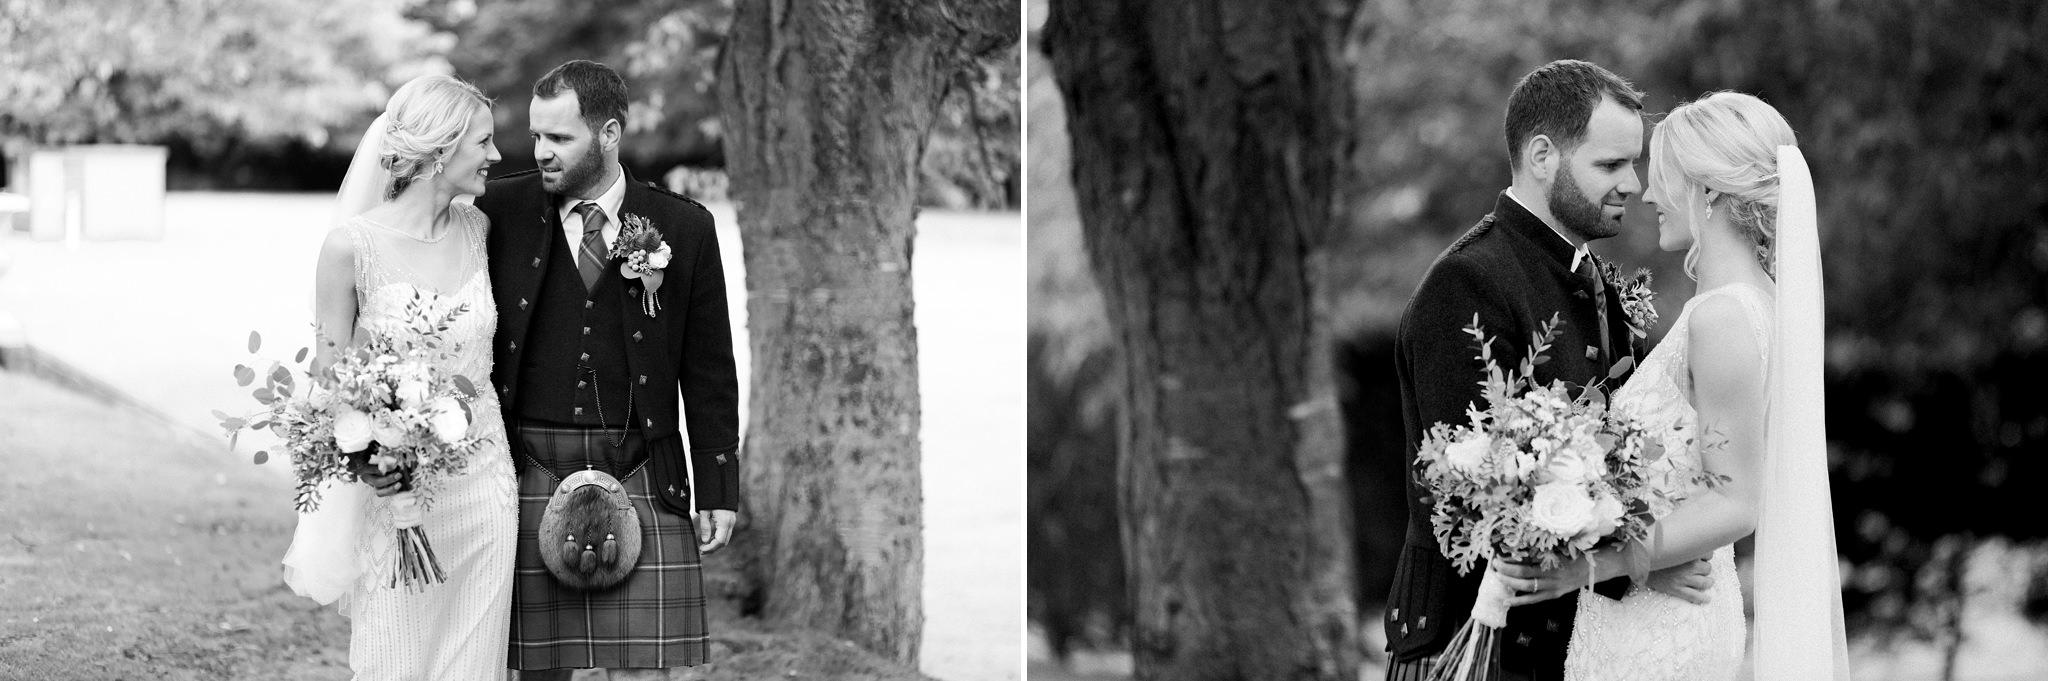 082-natural-wedding-photography.jpg